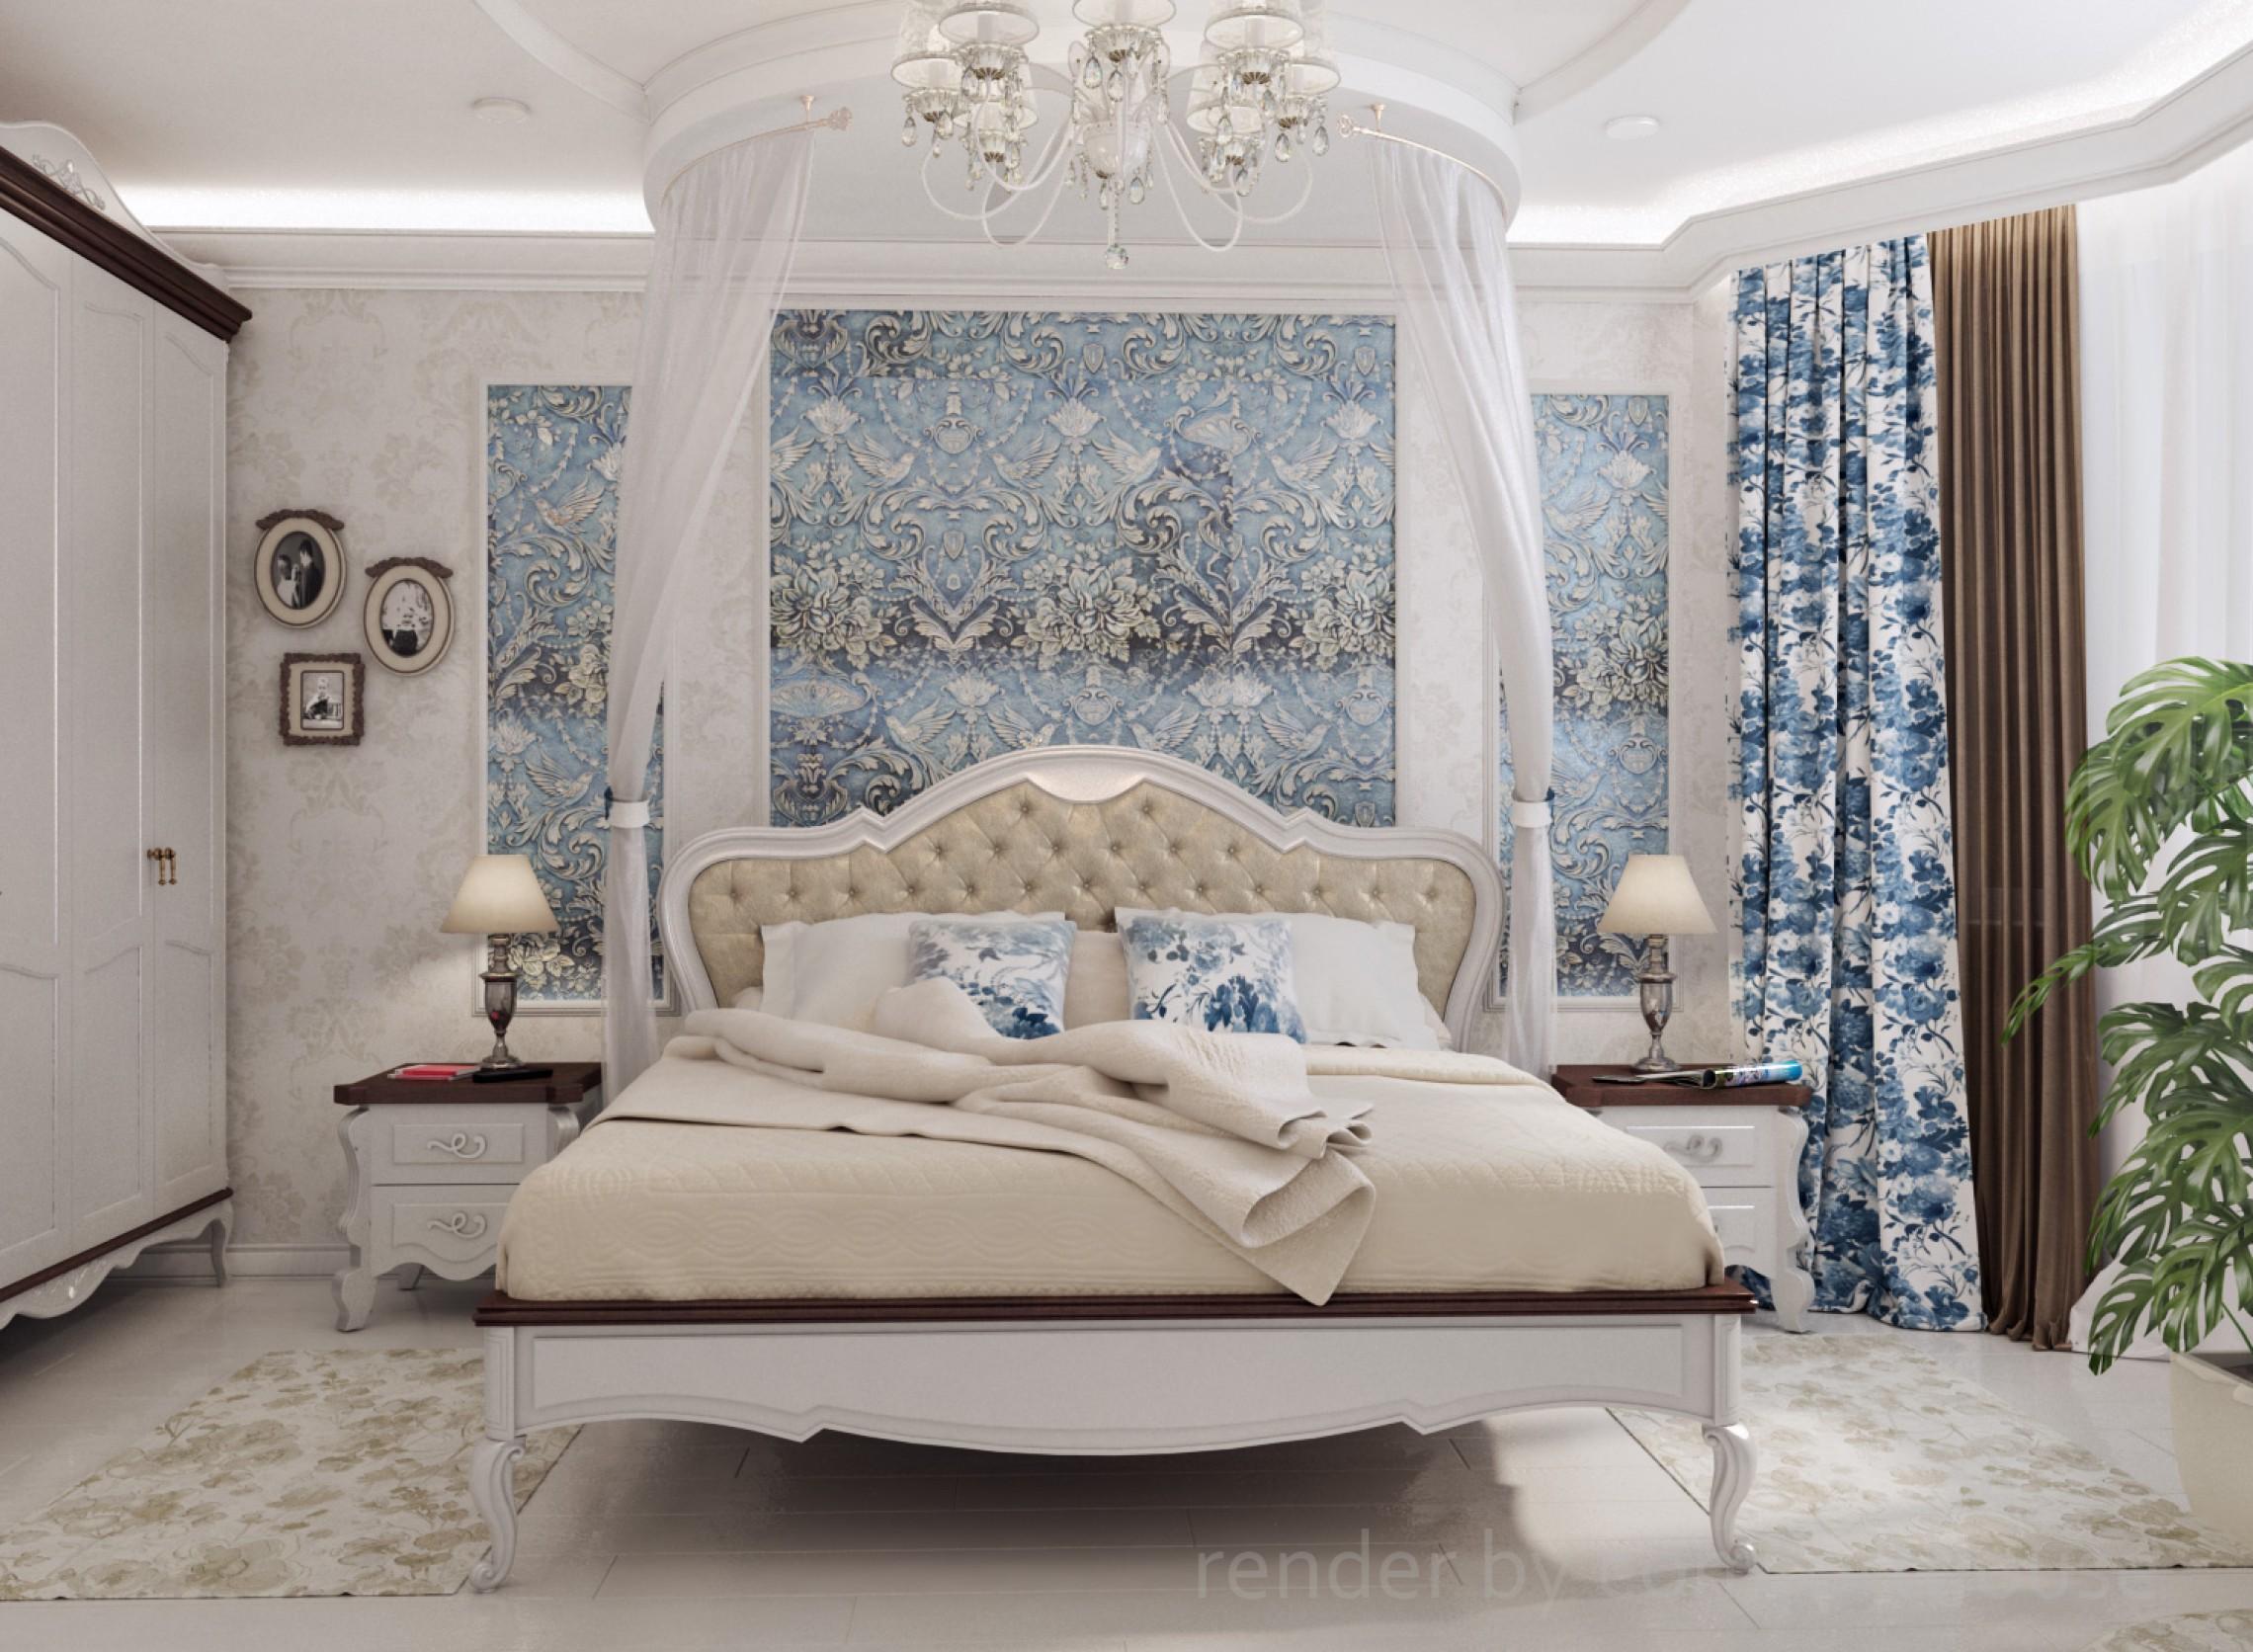 classic style bedroom